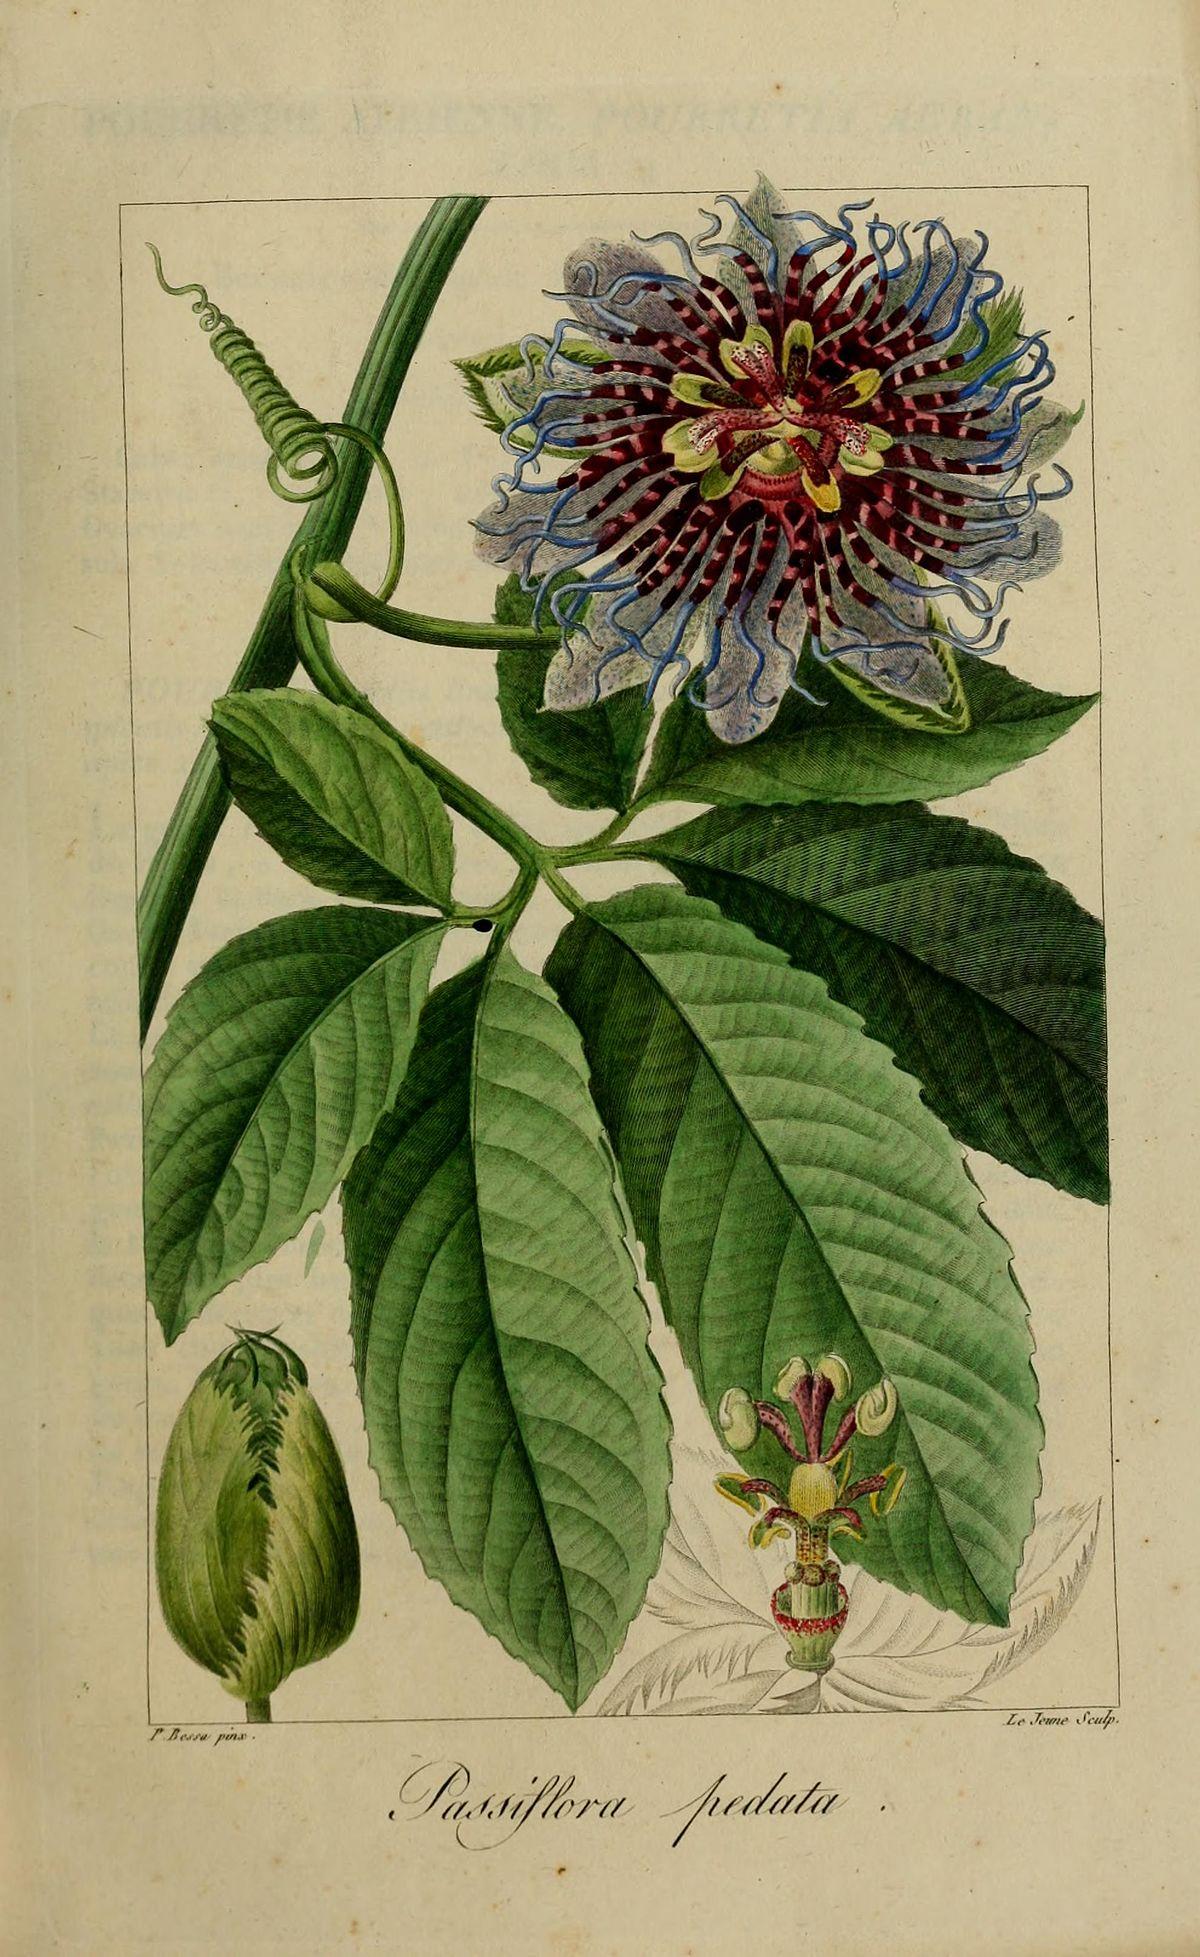 Passiflora Pedata Wikispecies